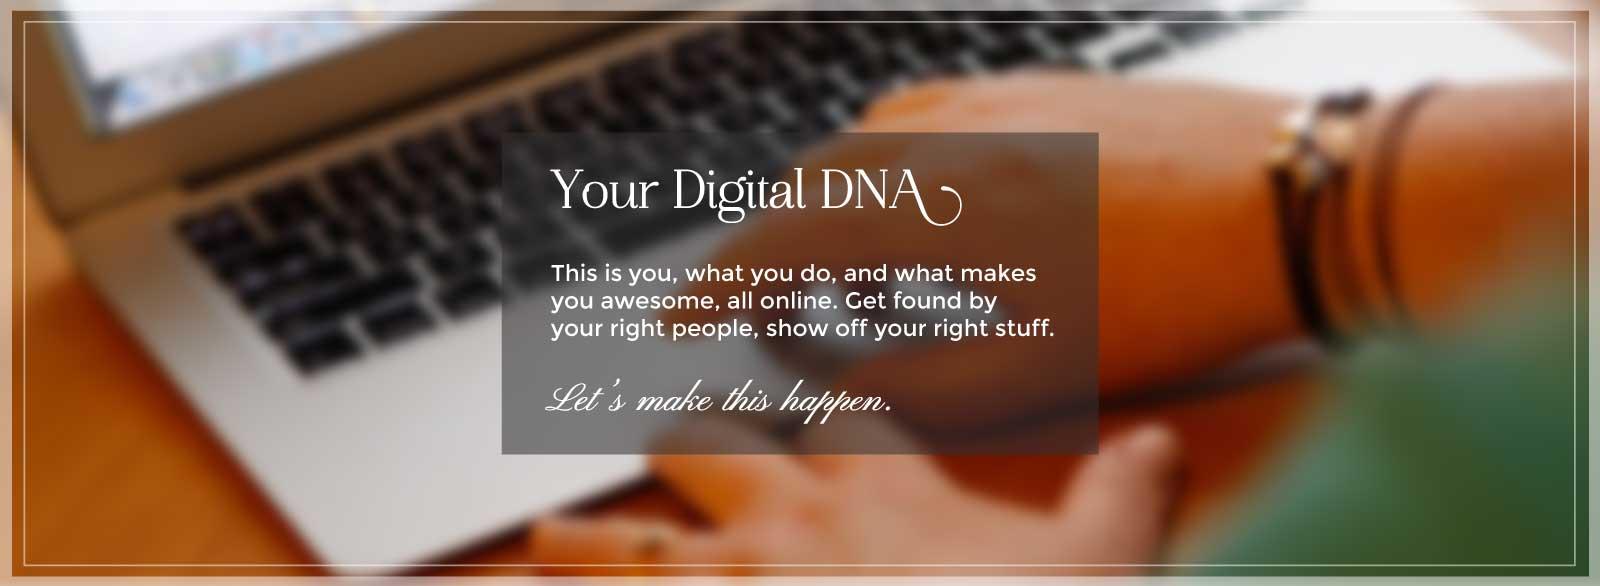 DigitalDNA